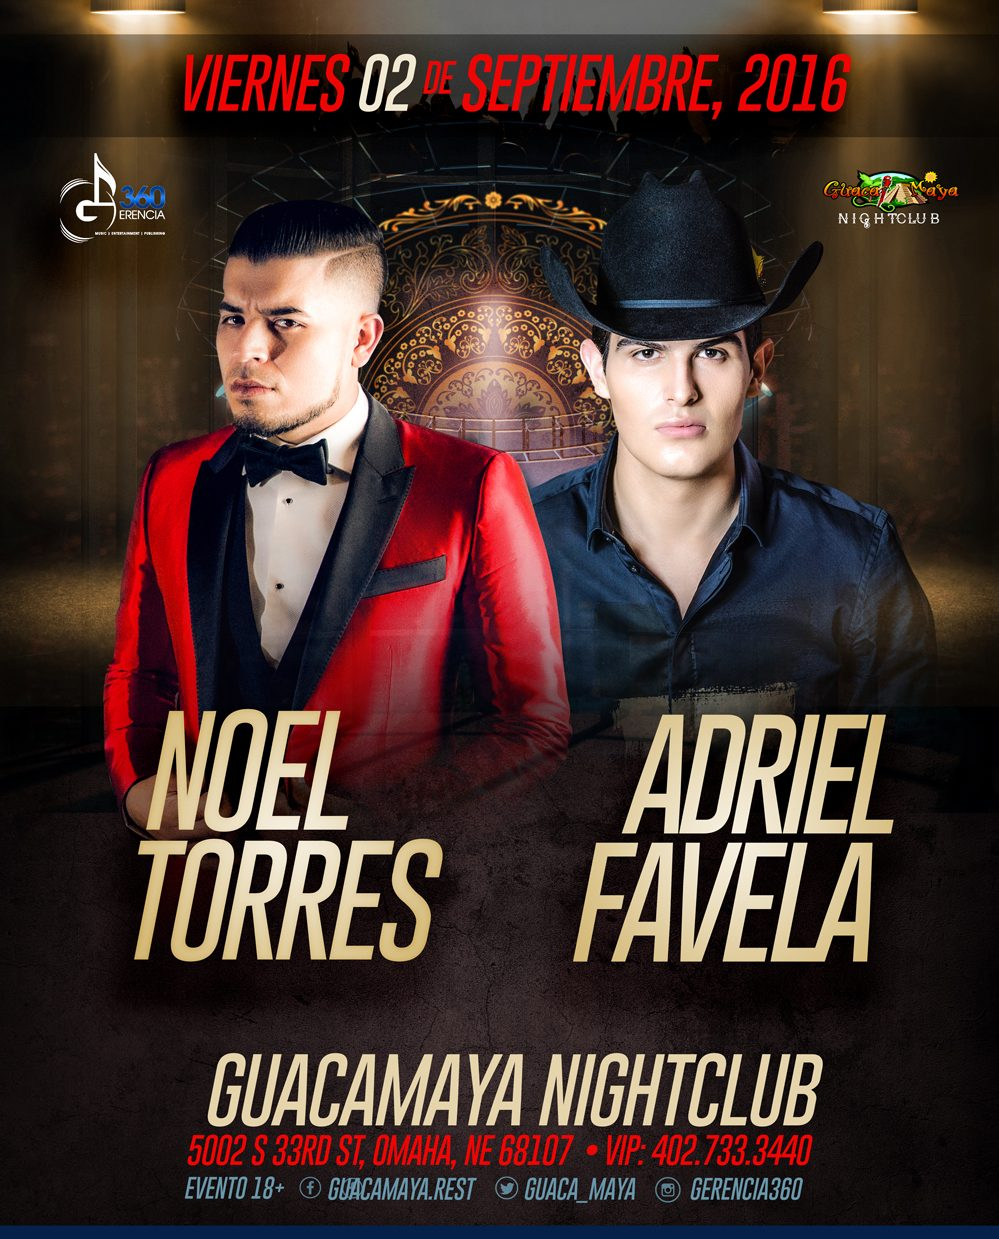 NOEL TORRES & ADRIEL FAVELA @ Guacamaya Night Club | Omaha | Nebraska | United States